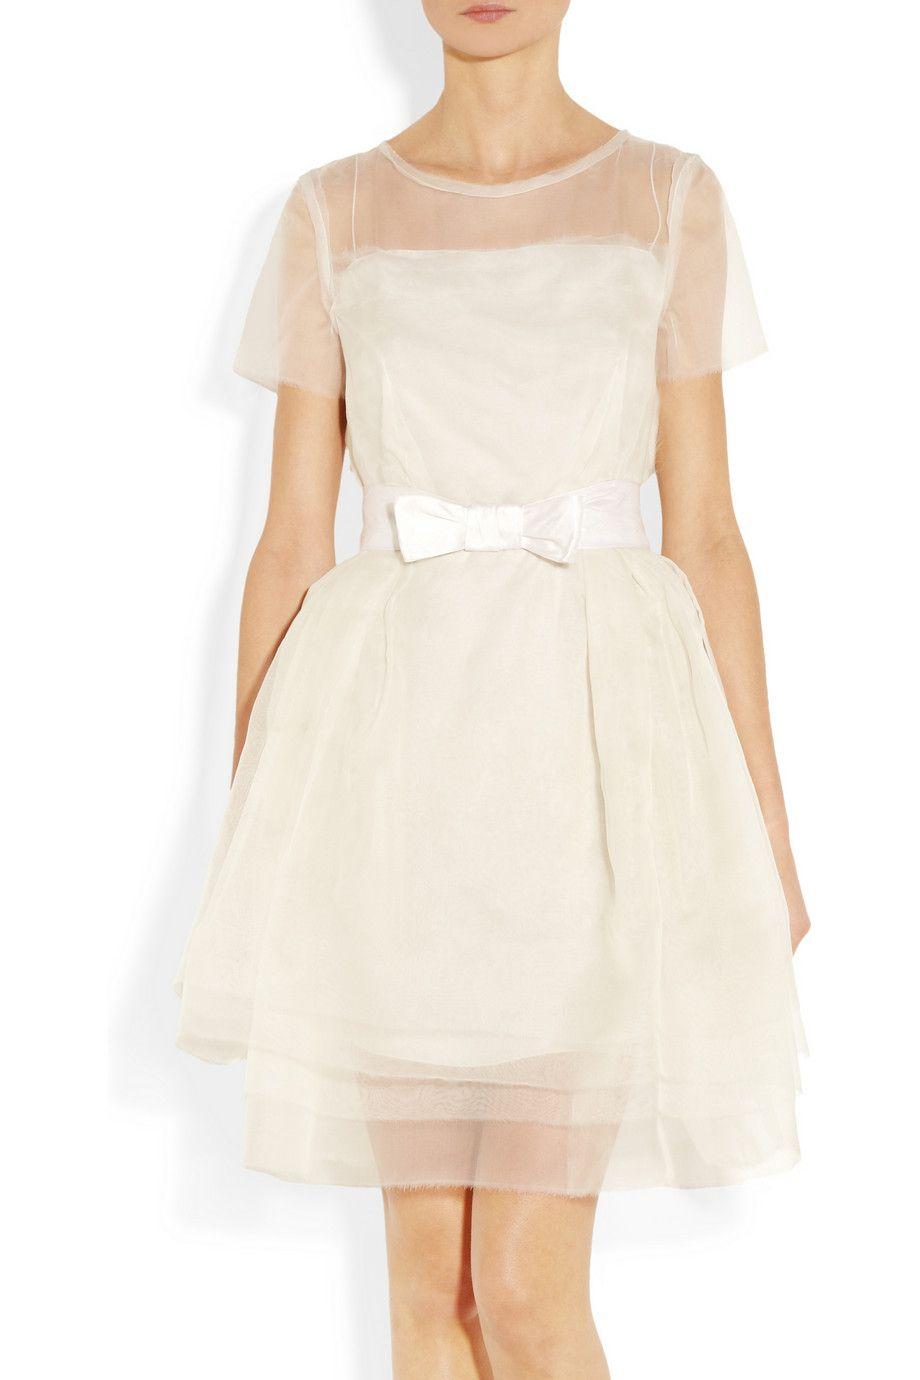 Lanvin Layered Silk Organza Dress Net A Porter Com Silk Organza Dress Dresses Beautiful Dresses [ 1380 x 920 Pixel ]